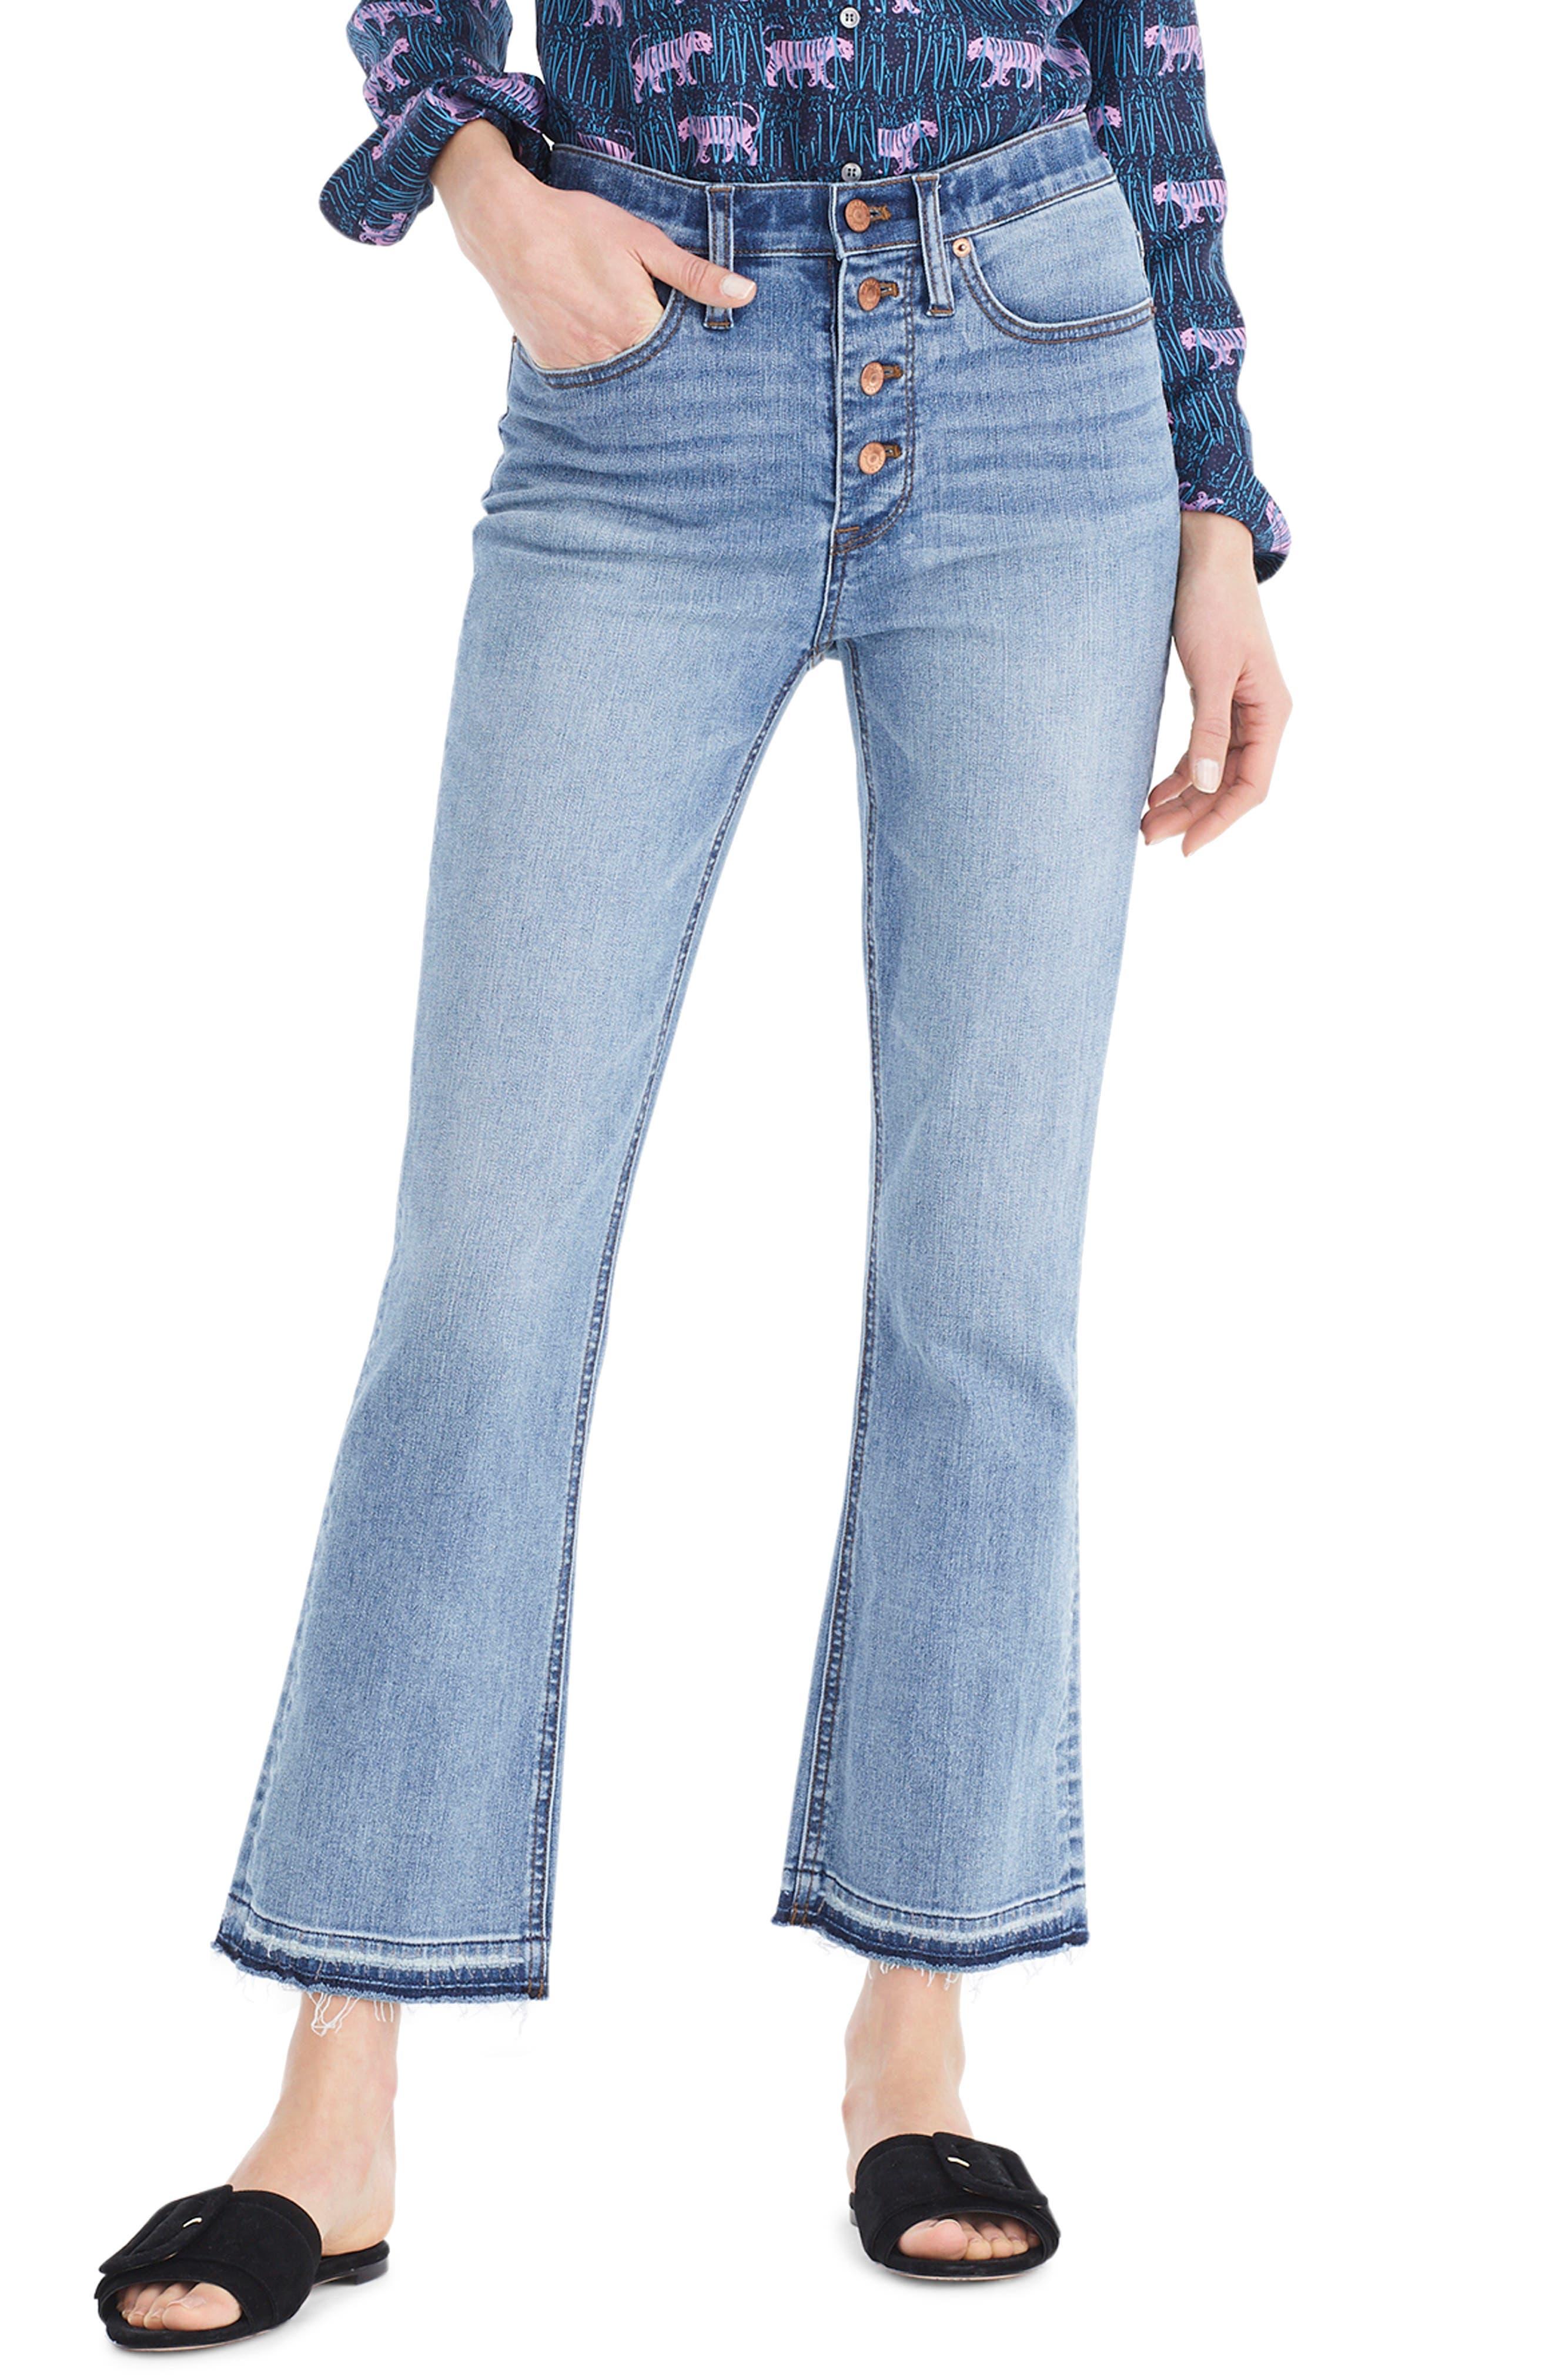 c2c6081533 Women s J.Crew Jeans   Denim